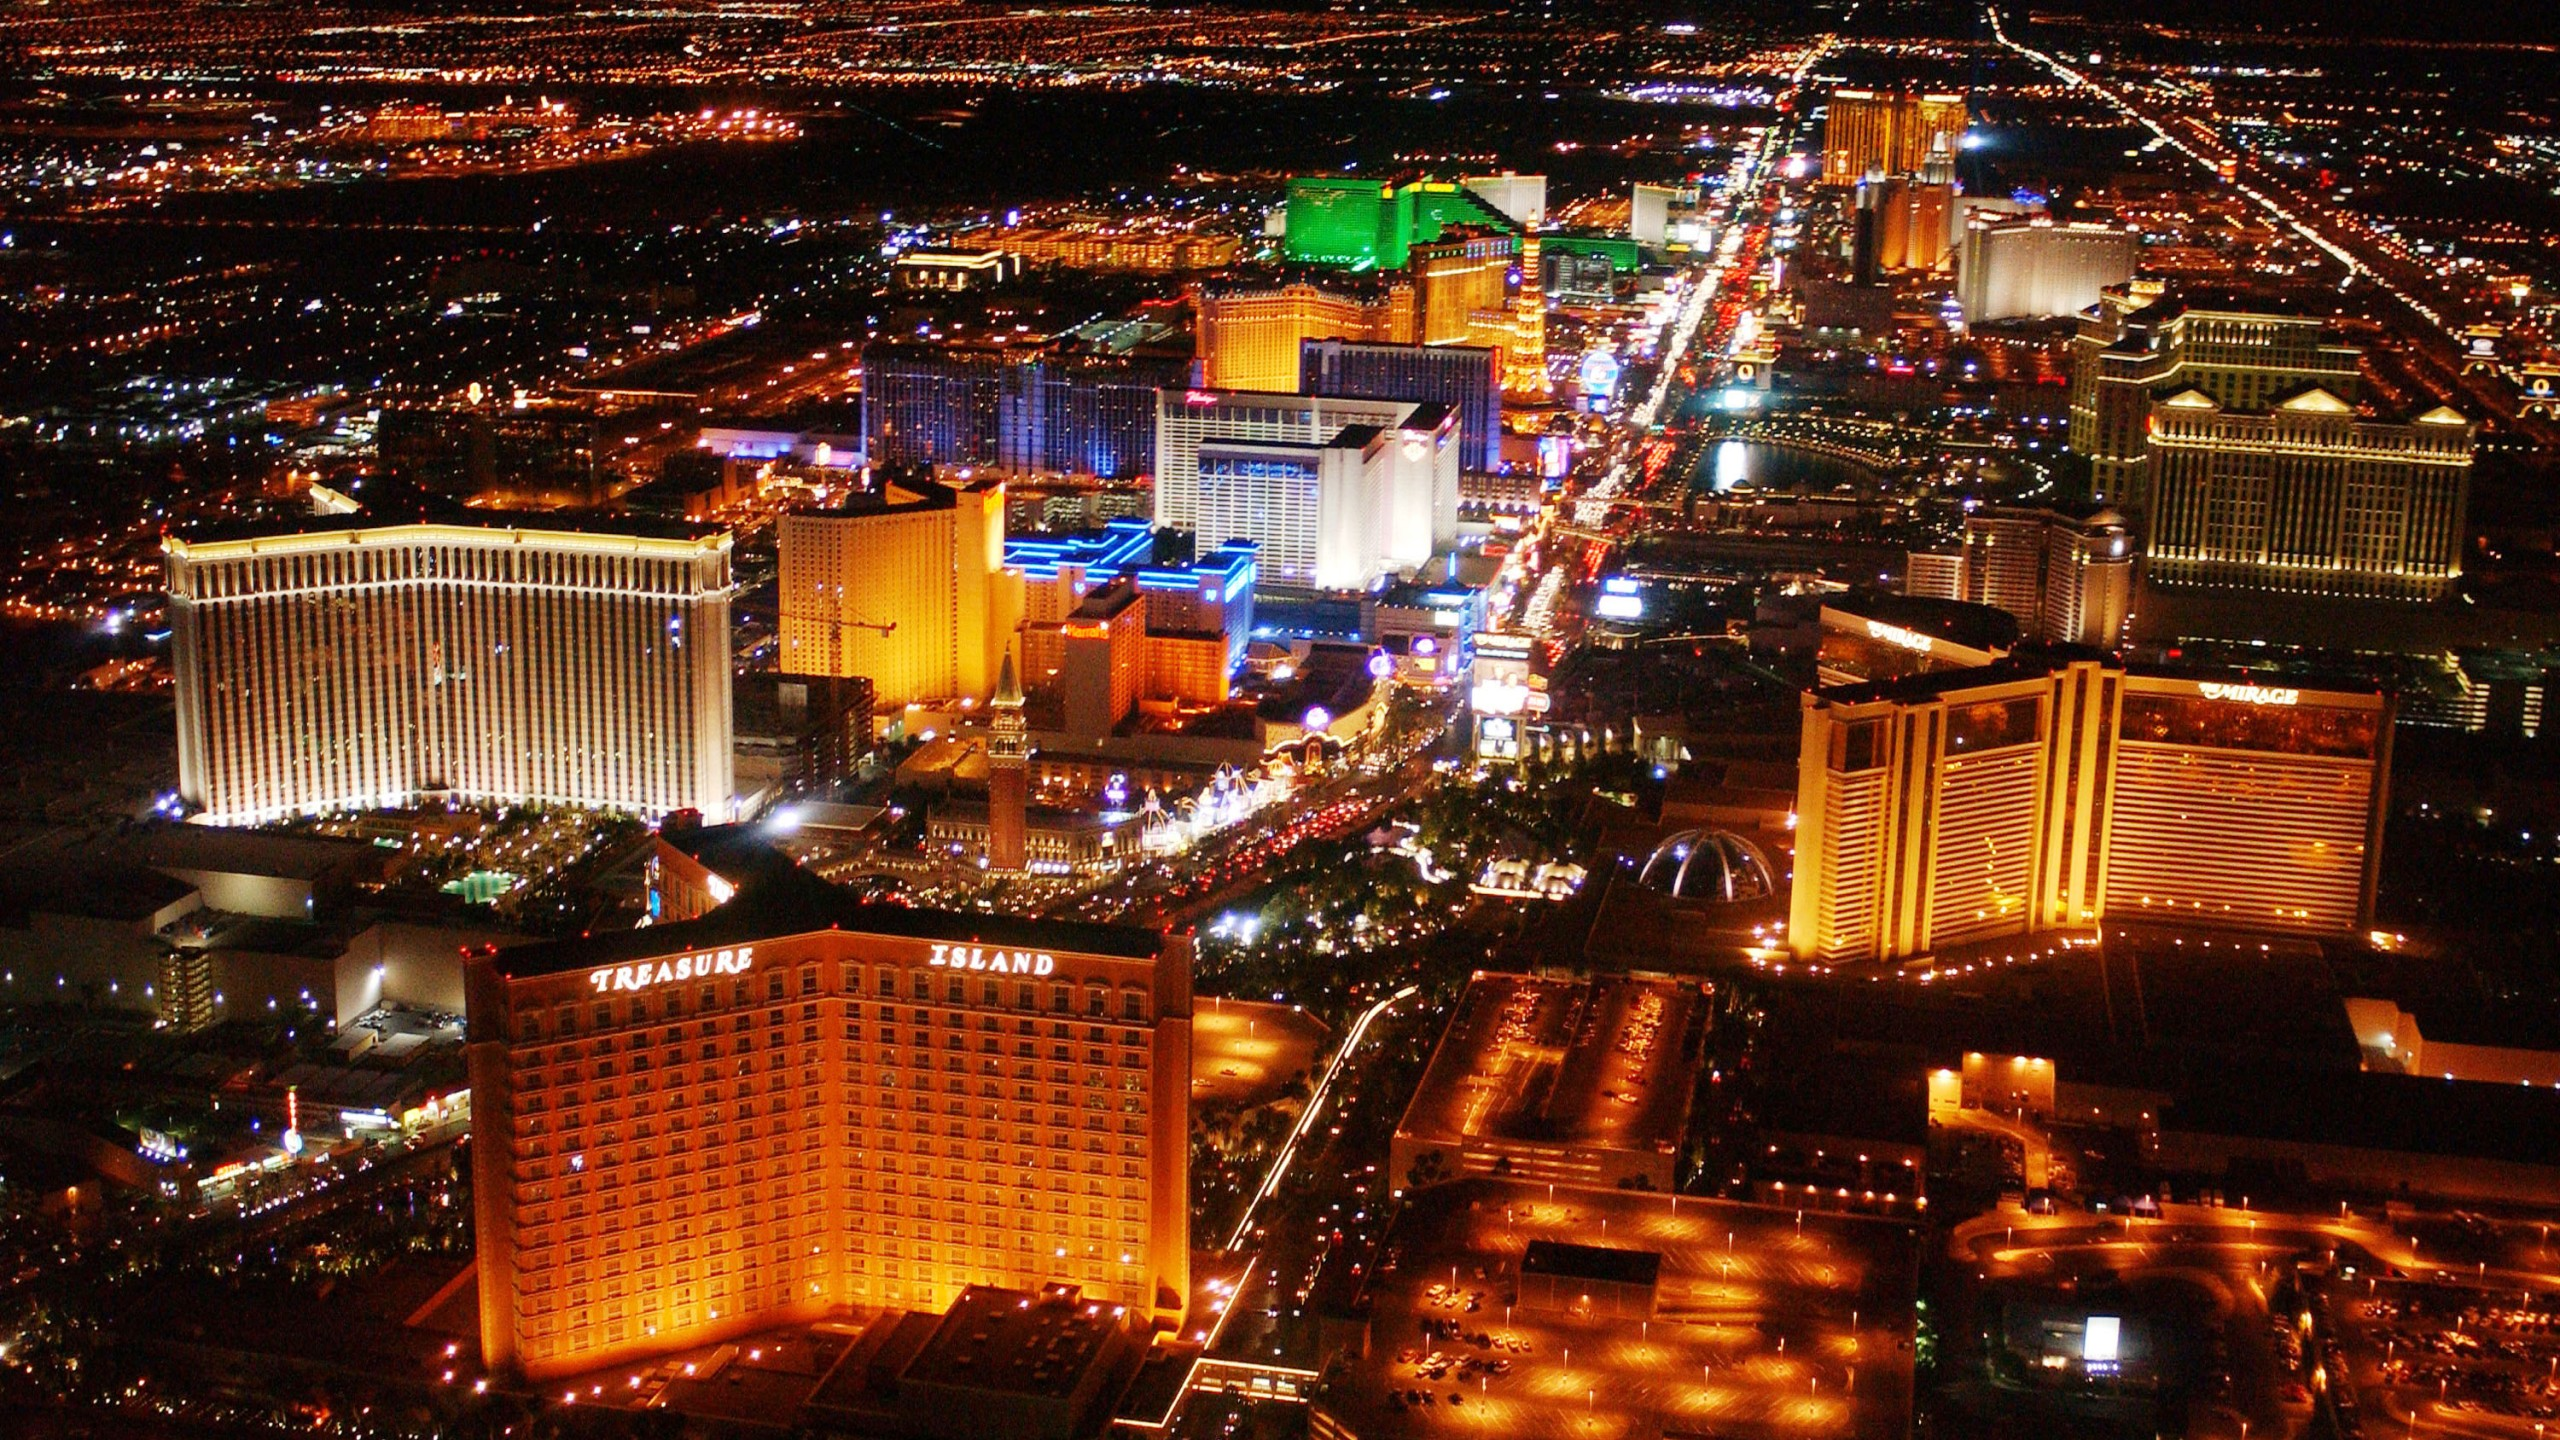 The strip on Las Vegas Boulevard is seen on May 30, 2002 in Las Vegas, Nevada. (Credit: Robert Mora/Getty Images)